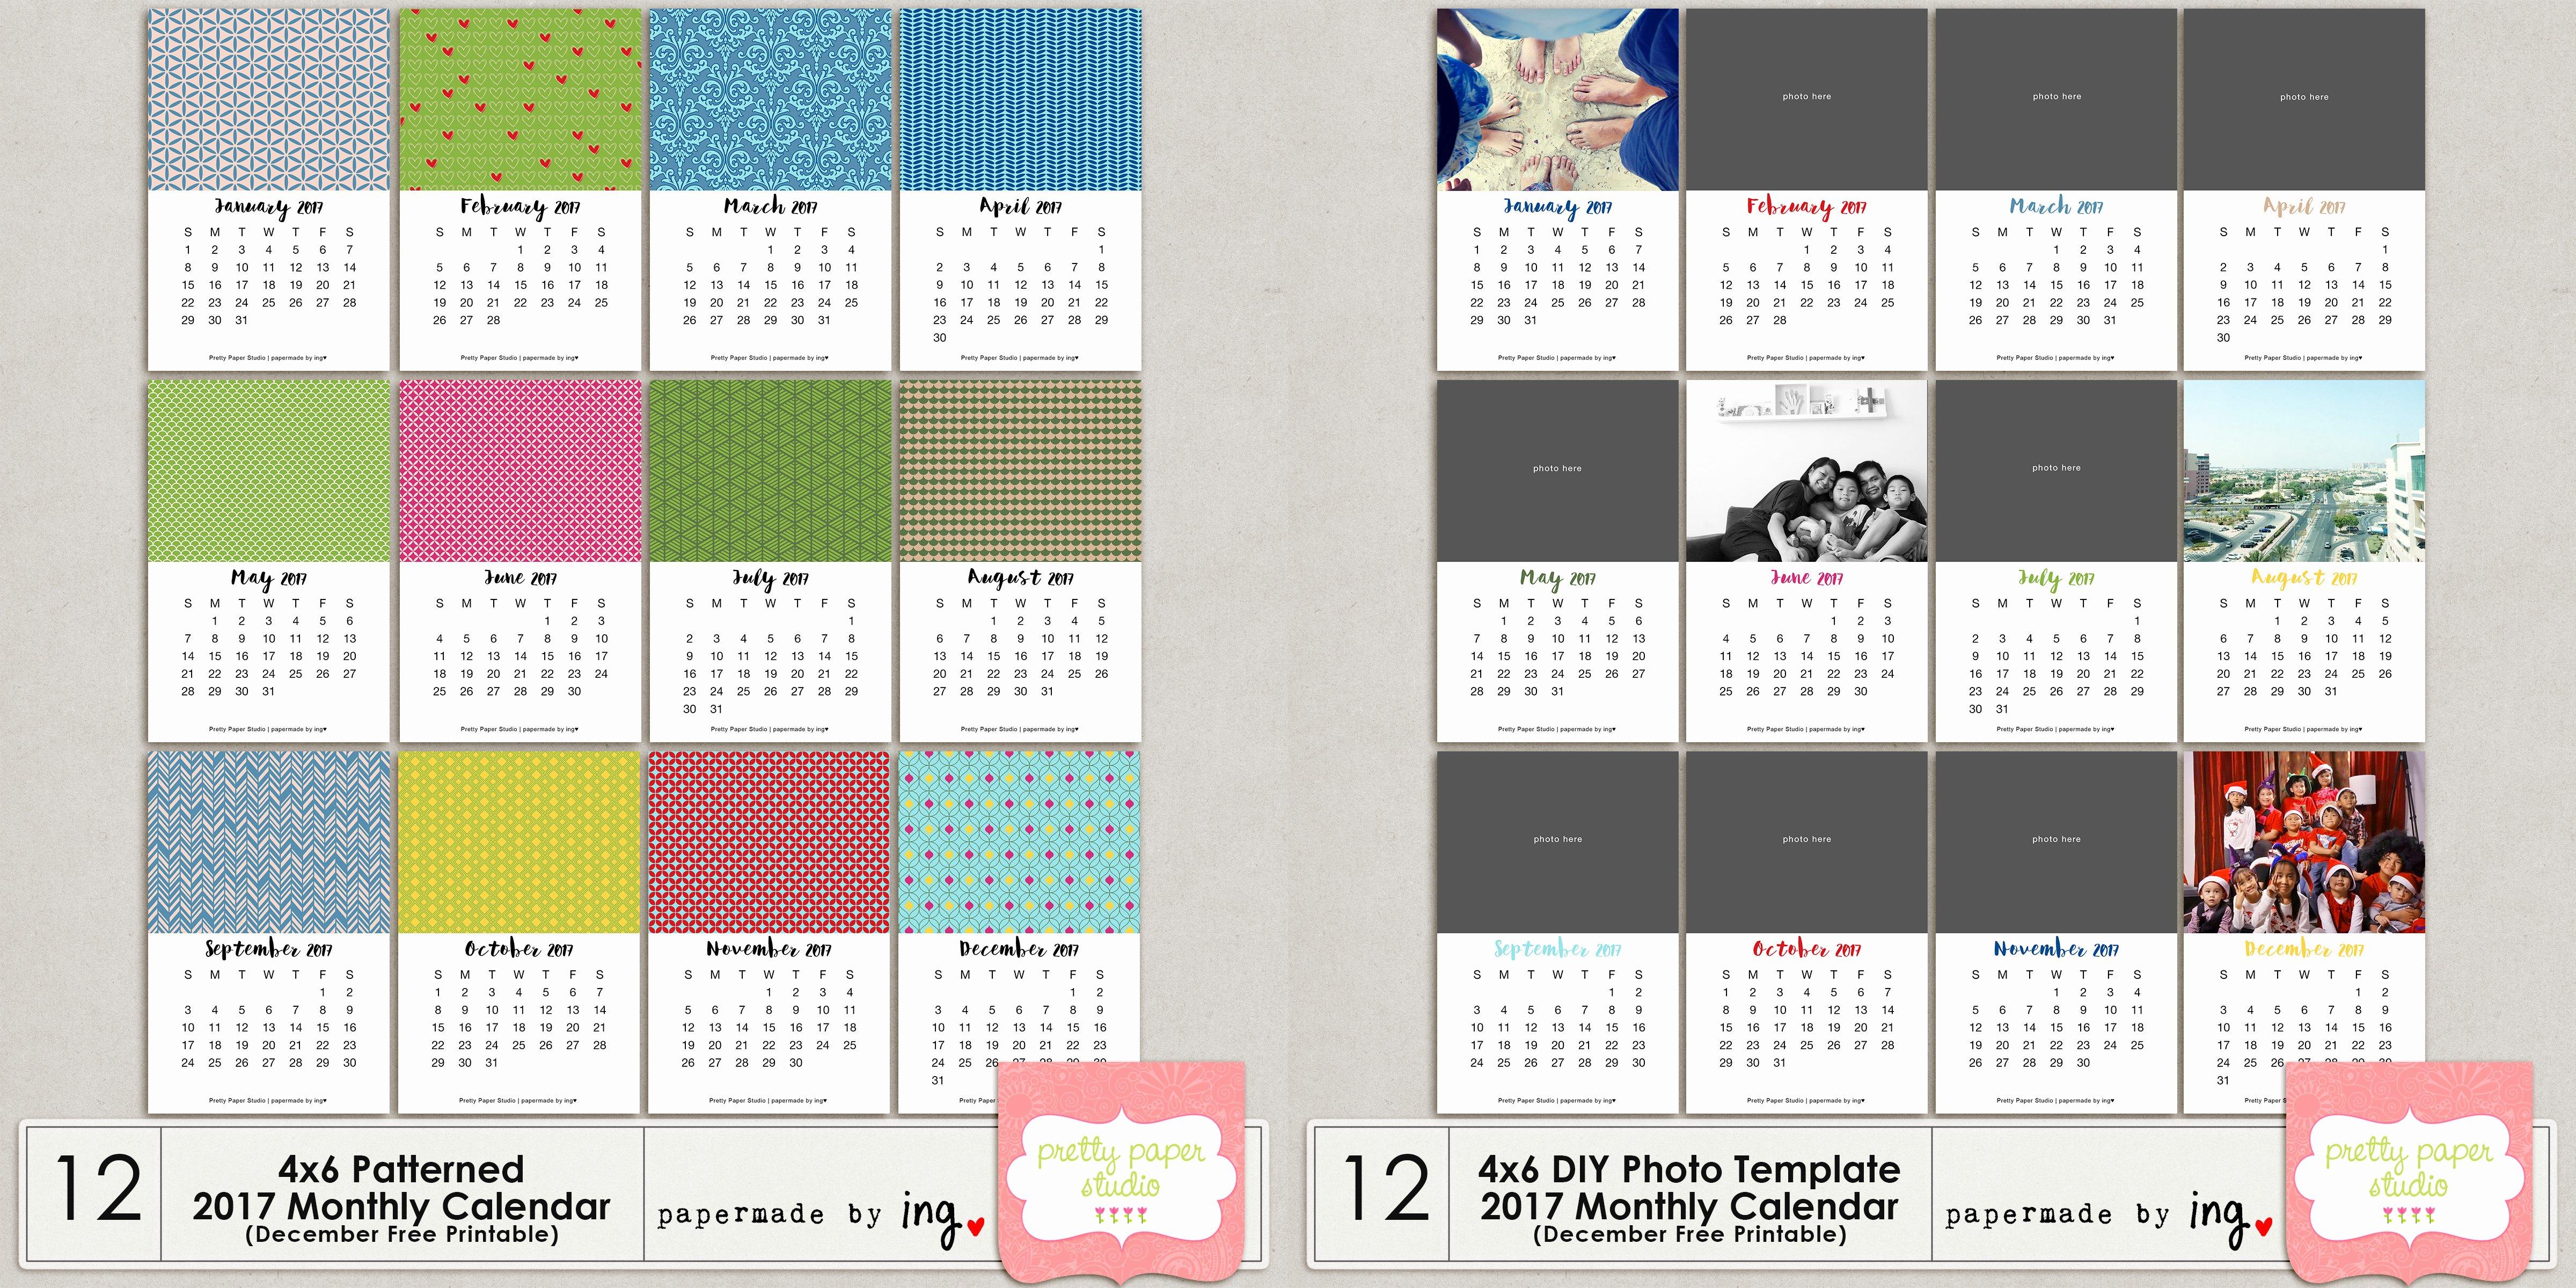 4x6 Photo Template Unique 4x6 Diy Template 2017 Monthly Calendar